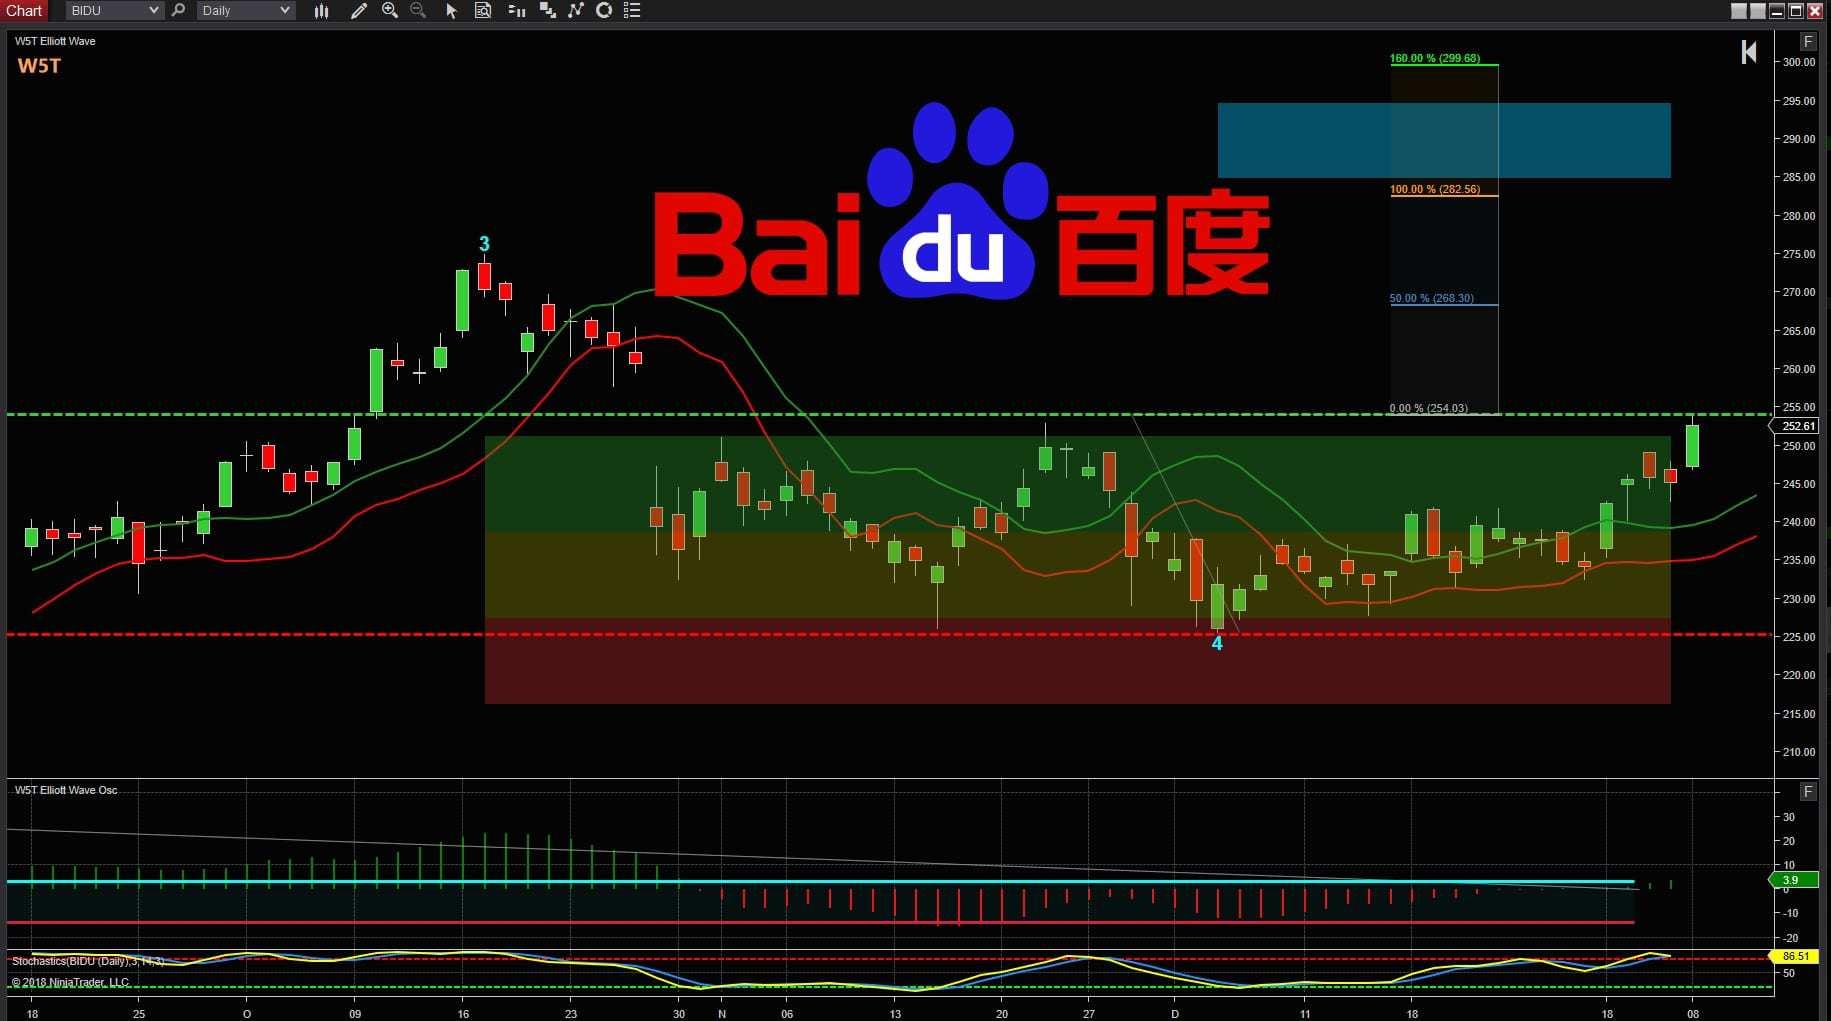 image of BIDU logo on Trading Chart for Stocks Trade Idea